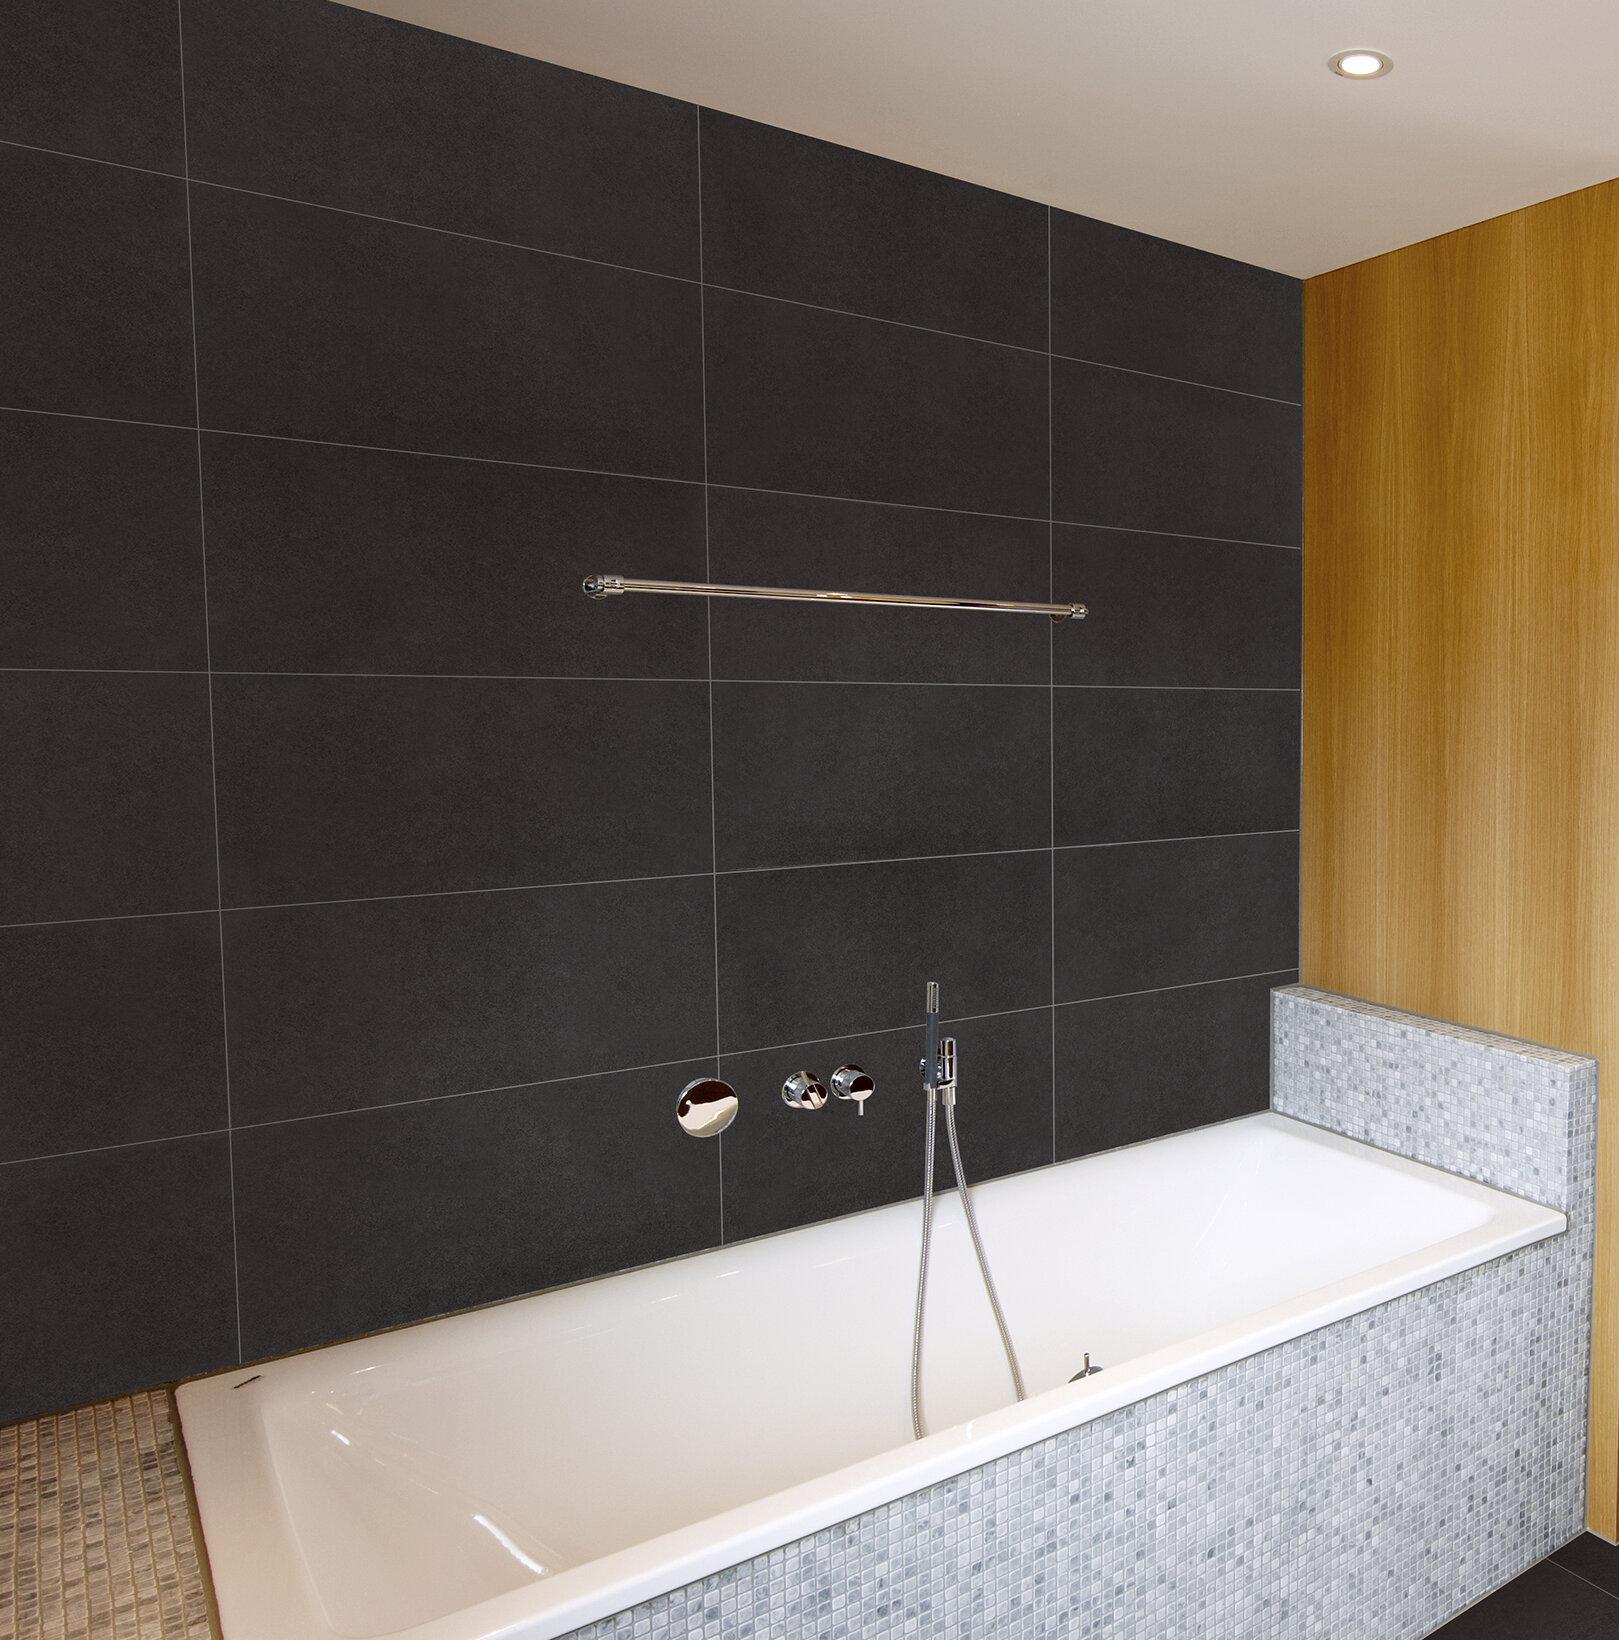 Msi Dimensions Graphite 12 X 24 Porcelain Field Tile In Gray Reviews Wayfair